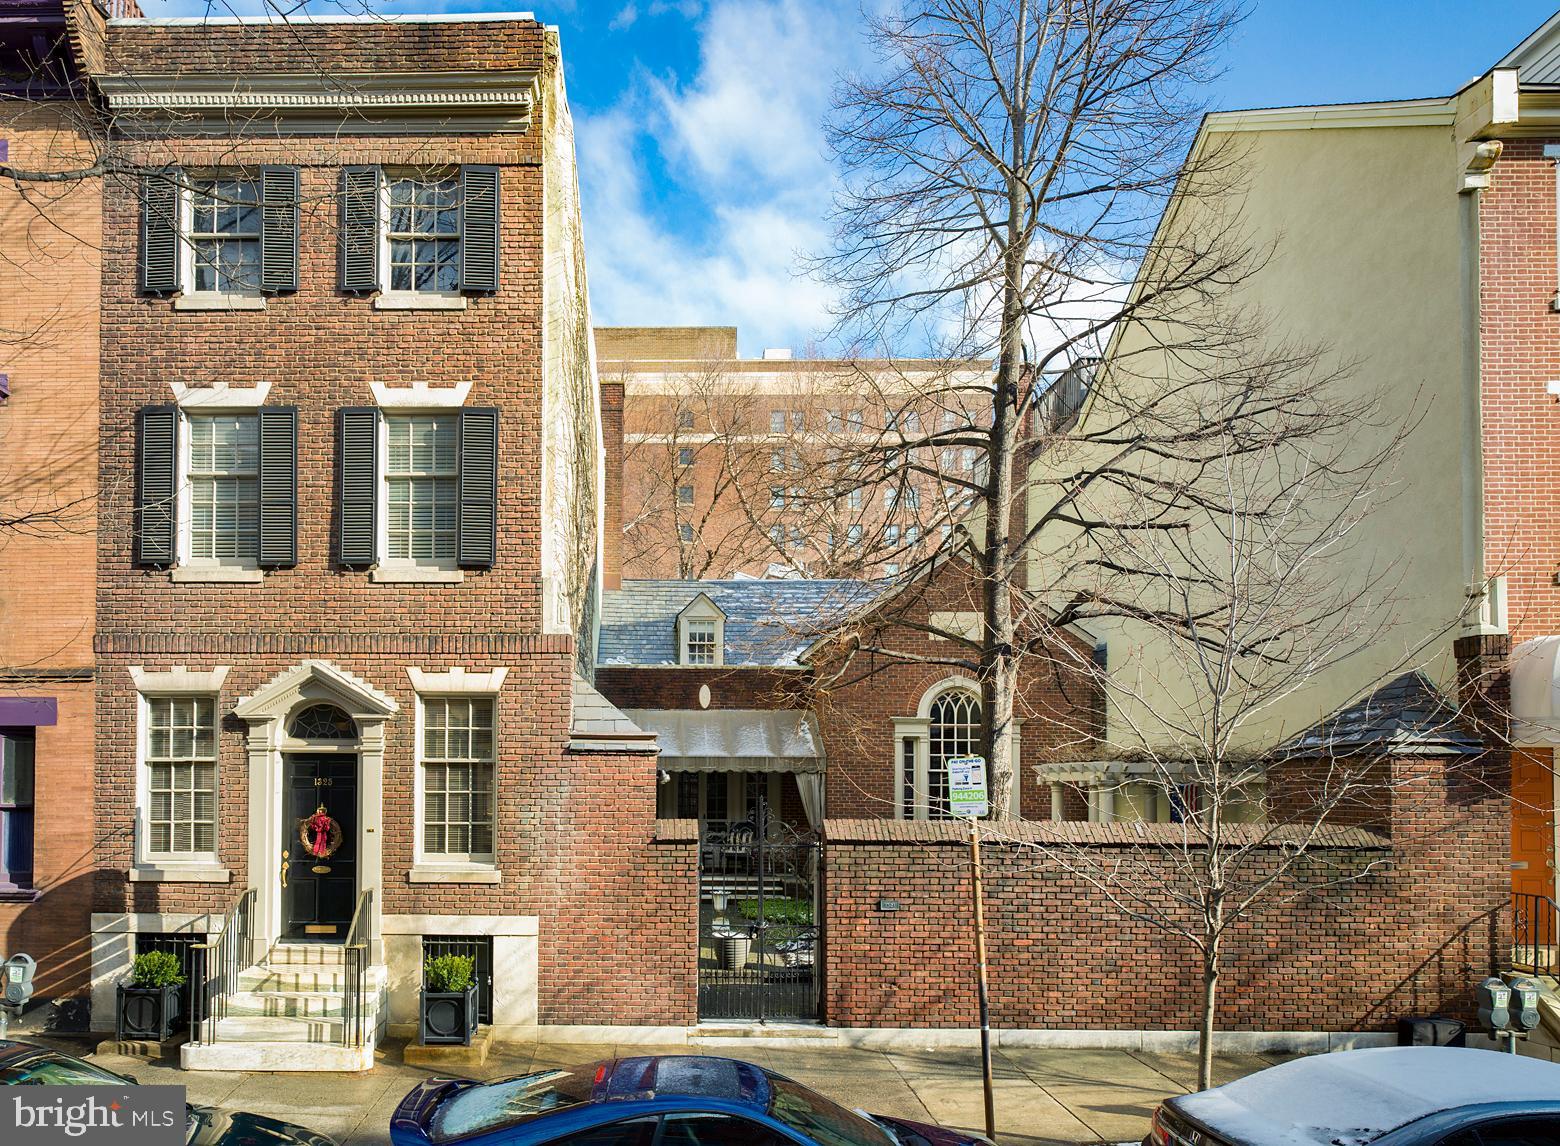 1321-1325 Pine St, Philadelphia, PA, 19107